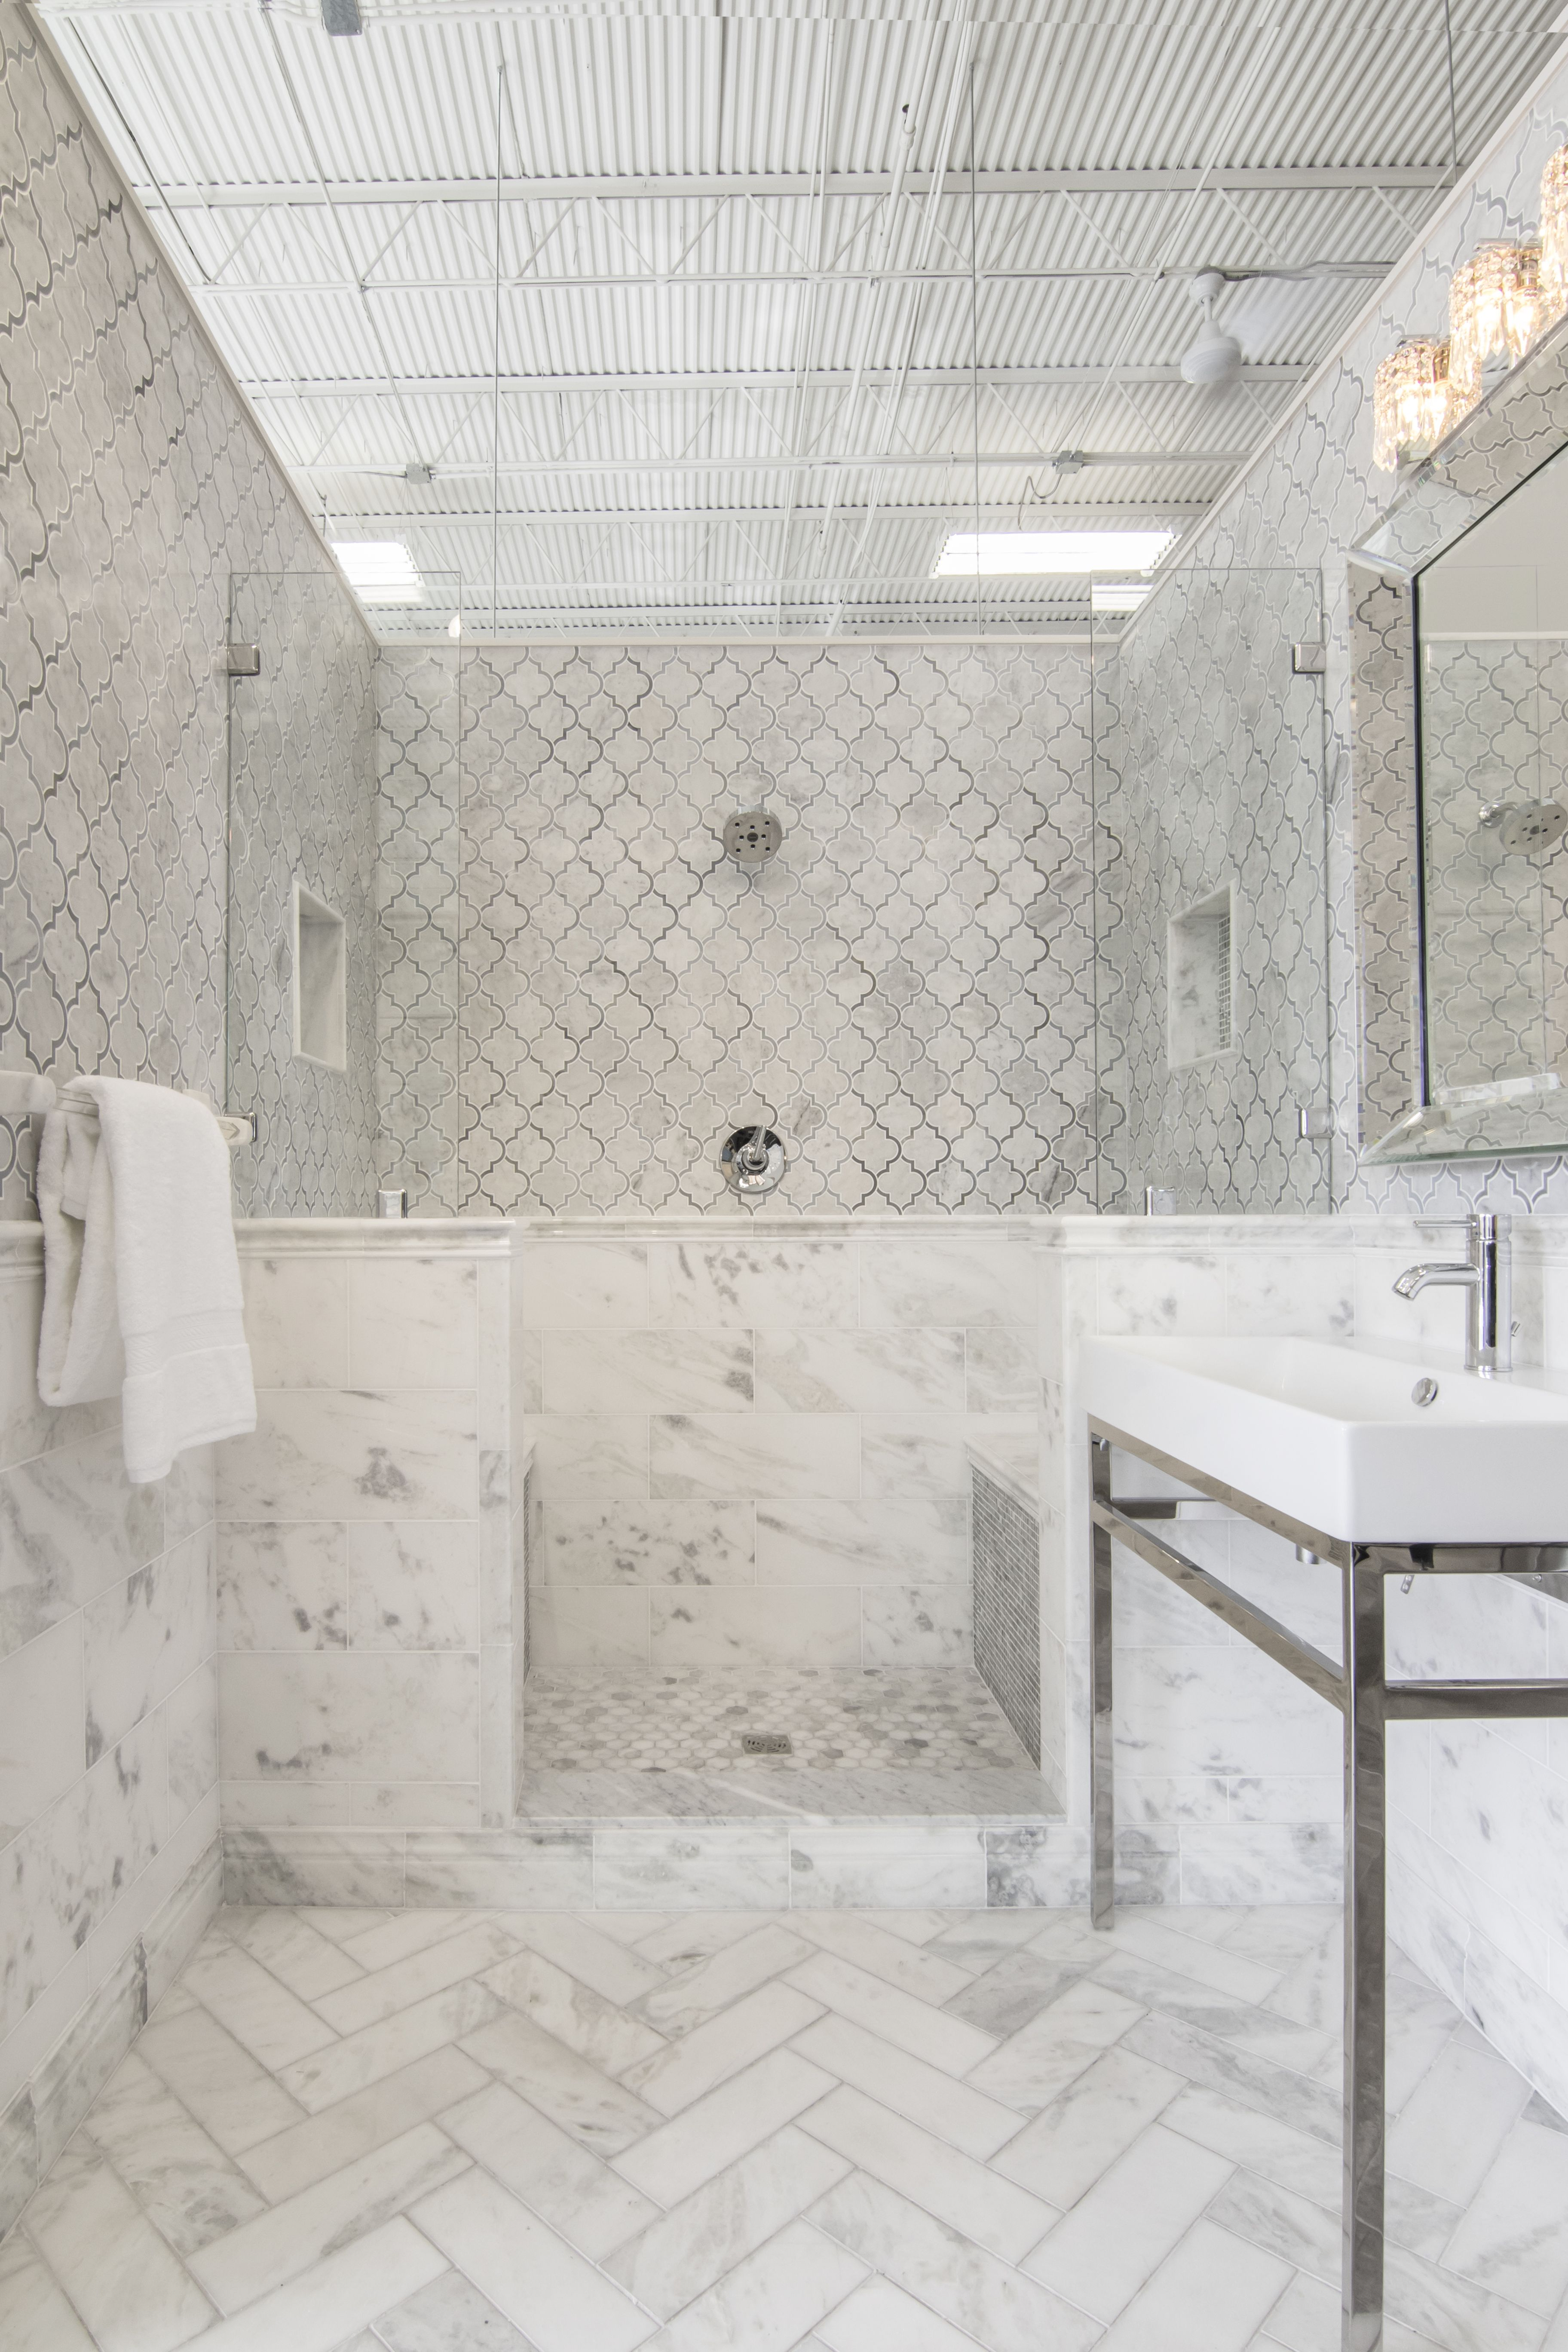 Bathroom floor tile tempesta neve polished marble subway tile bathroom floor tile tempesta neve polished marble subway tile doublecrazyfo Images